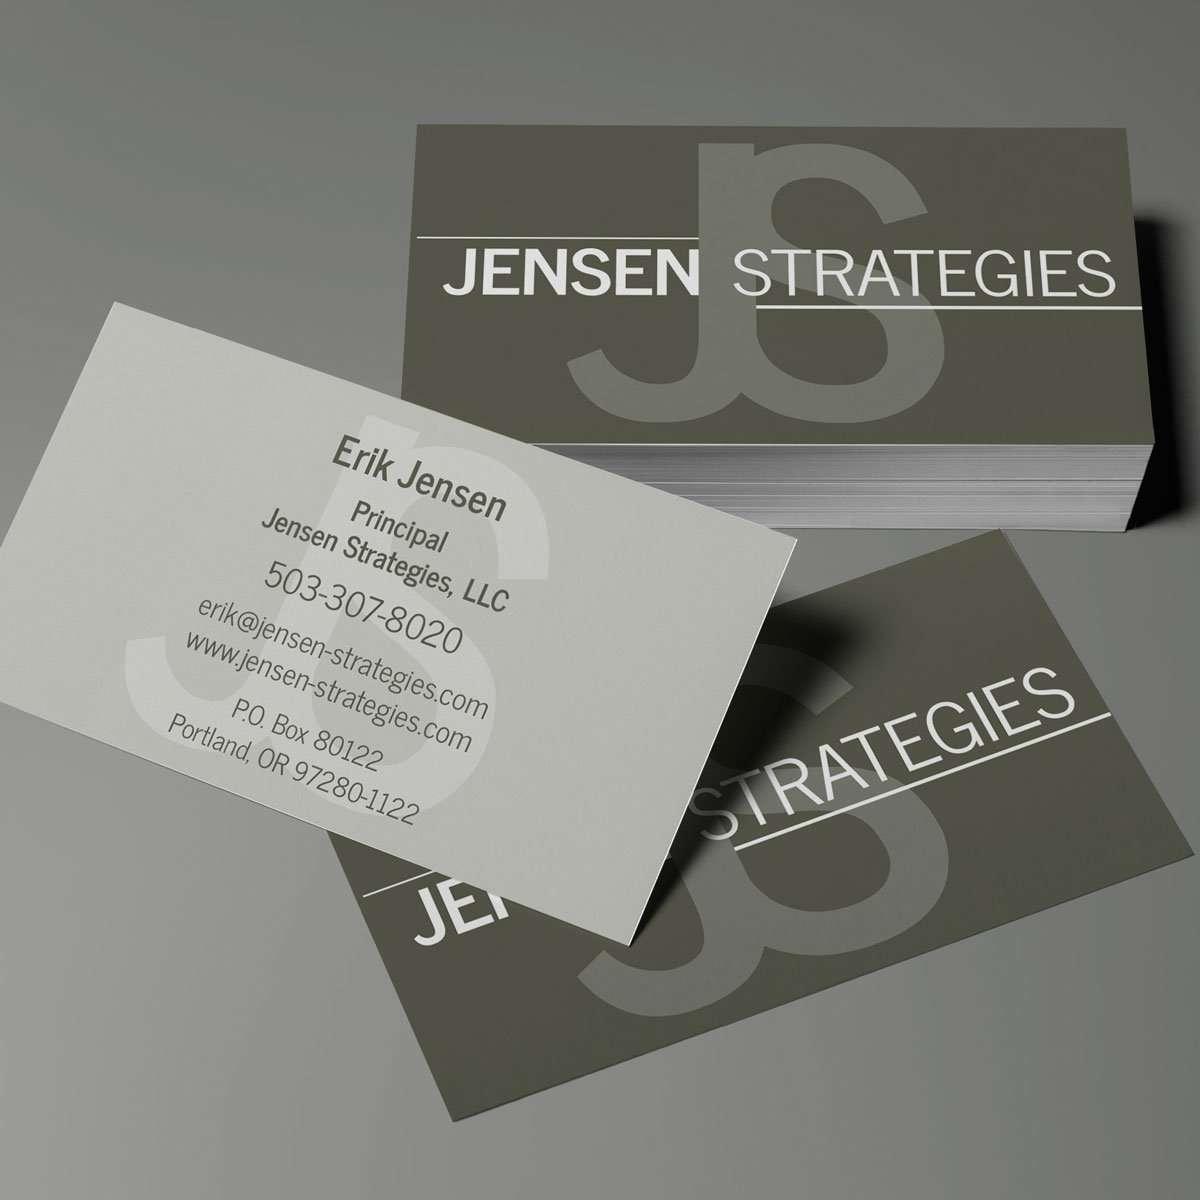 Jensen Strategies business card